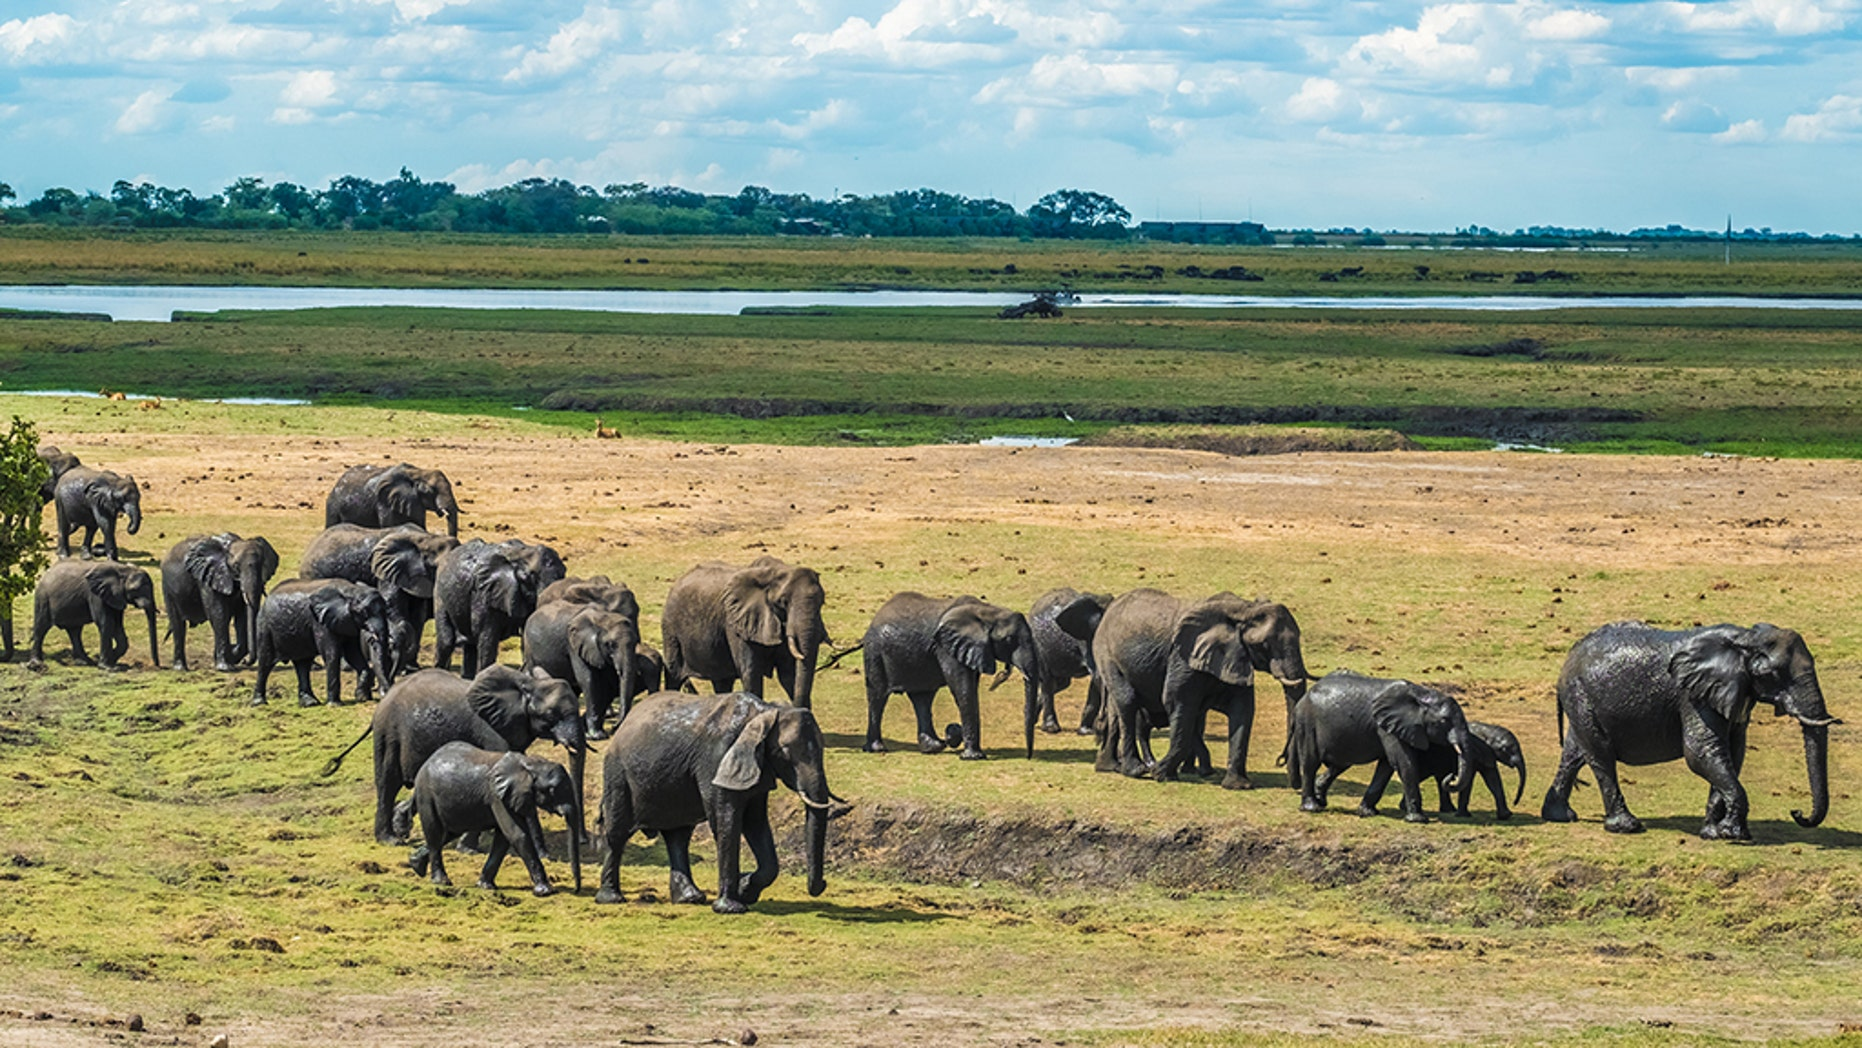 Large elephant herd taking a bath in the Chove river, Chobe Riverfront, Serondela, Chobe National Park, Botswana.